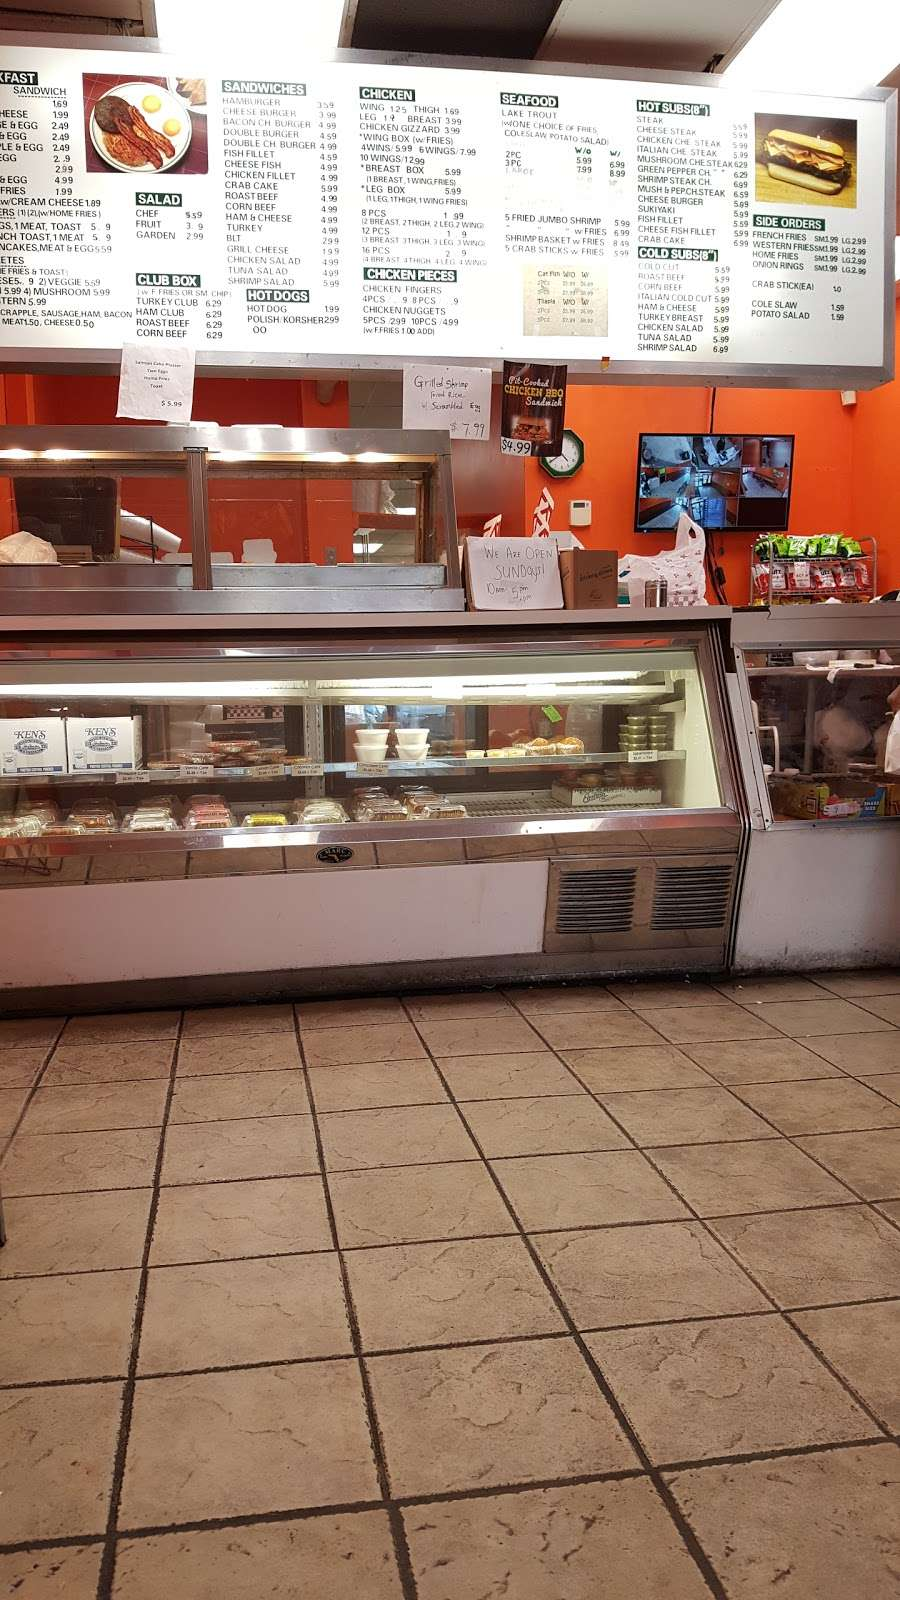 Chicken City - restaurant    Photo 1 of 6   Address: 7021 Liberty Rd, Gwynn Oak, MD 21207, USA   Phone: (410) 265-1669